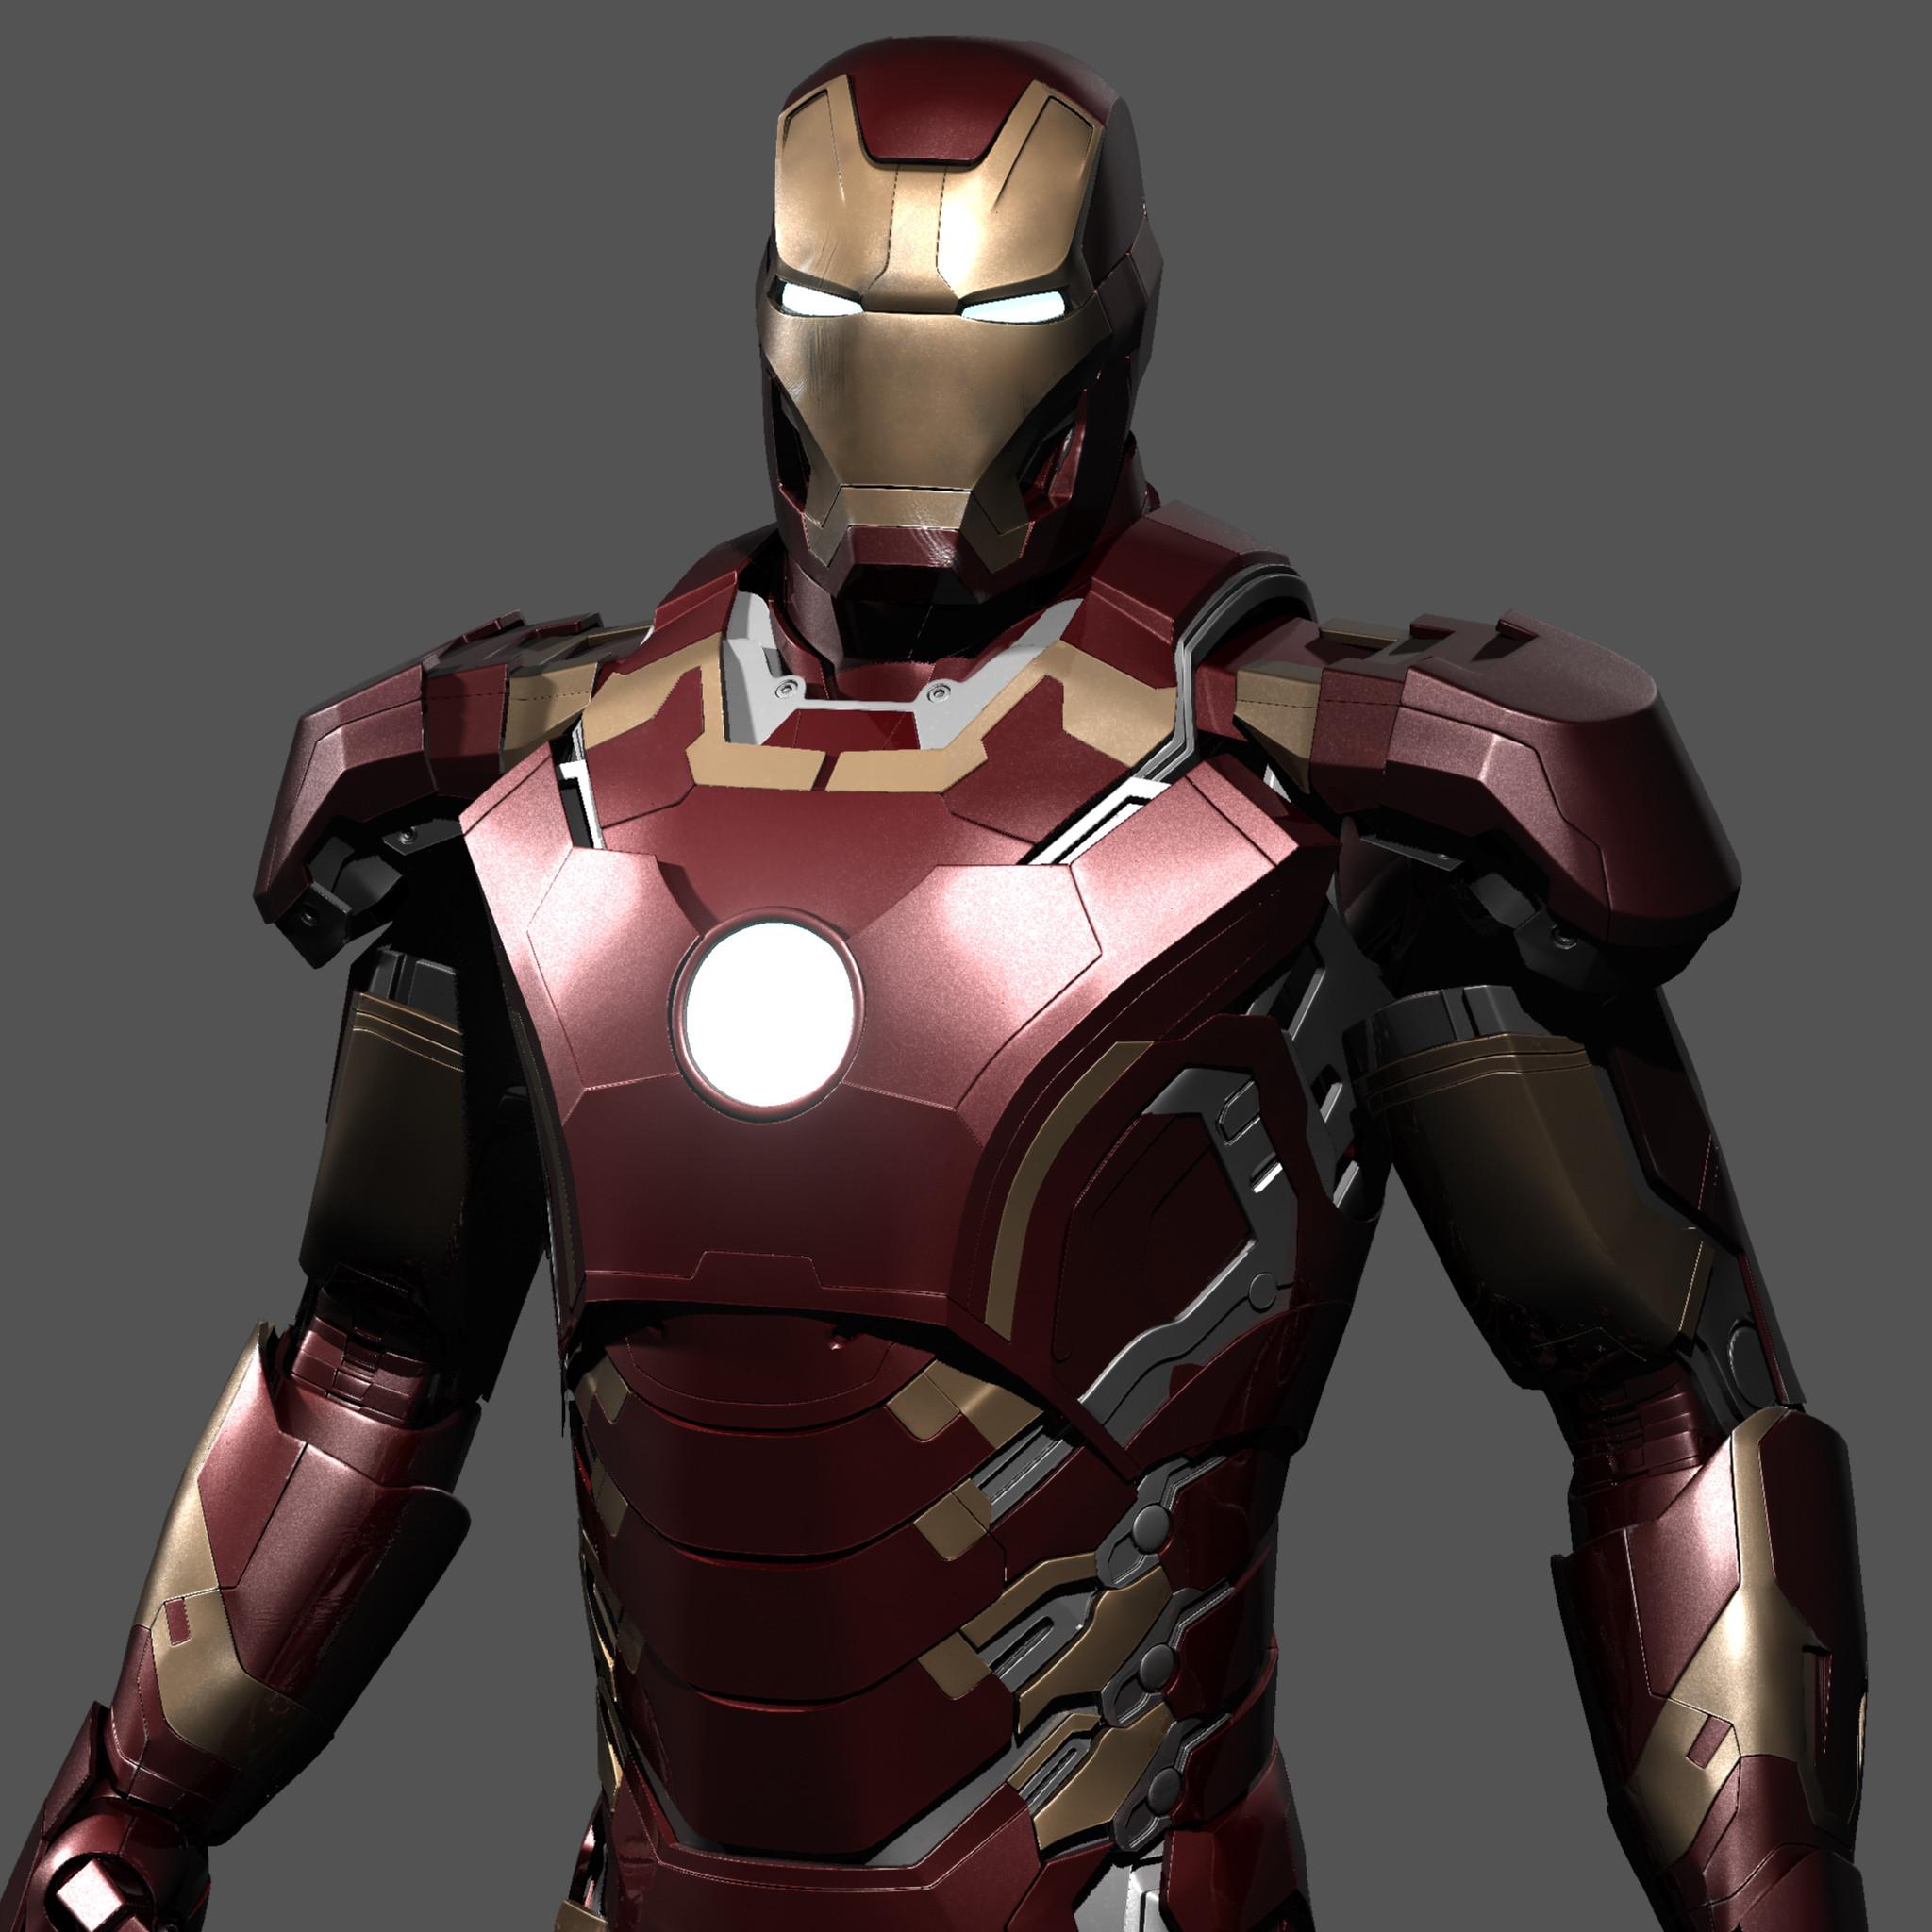 Iron man avengers age of ultron 3d model best of 3d models Best 3d models